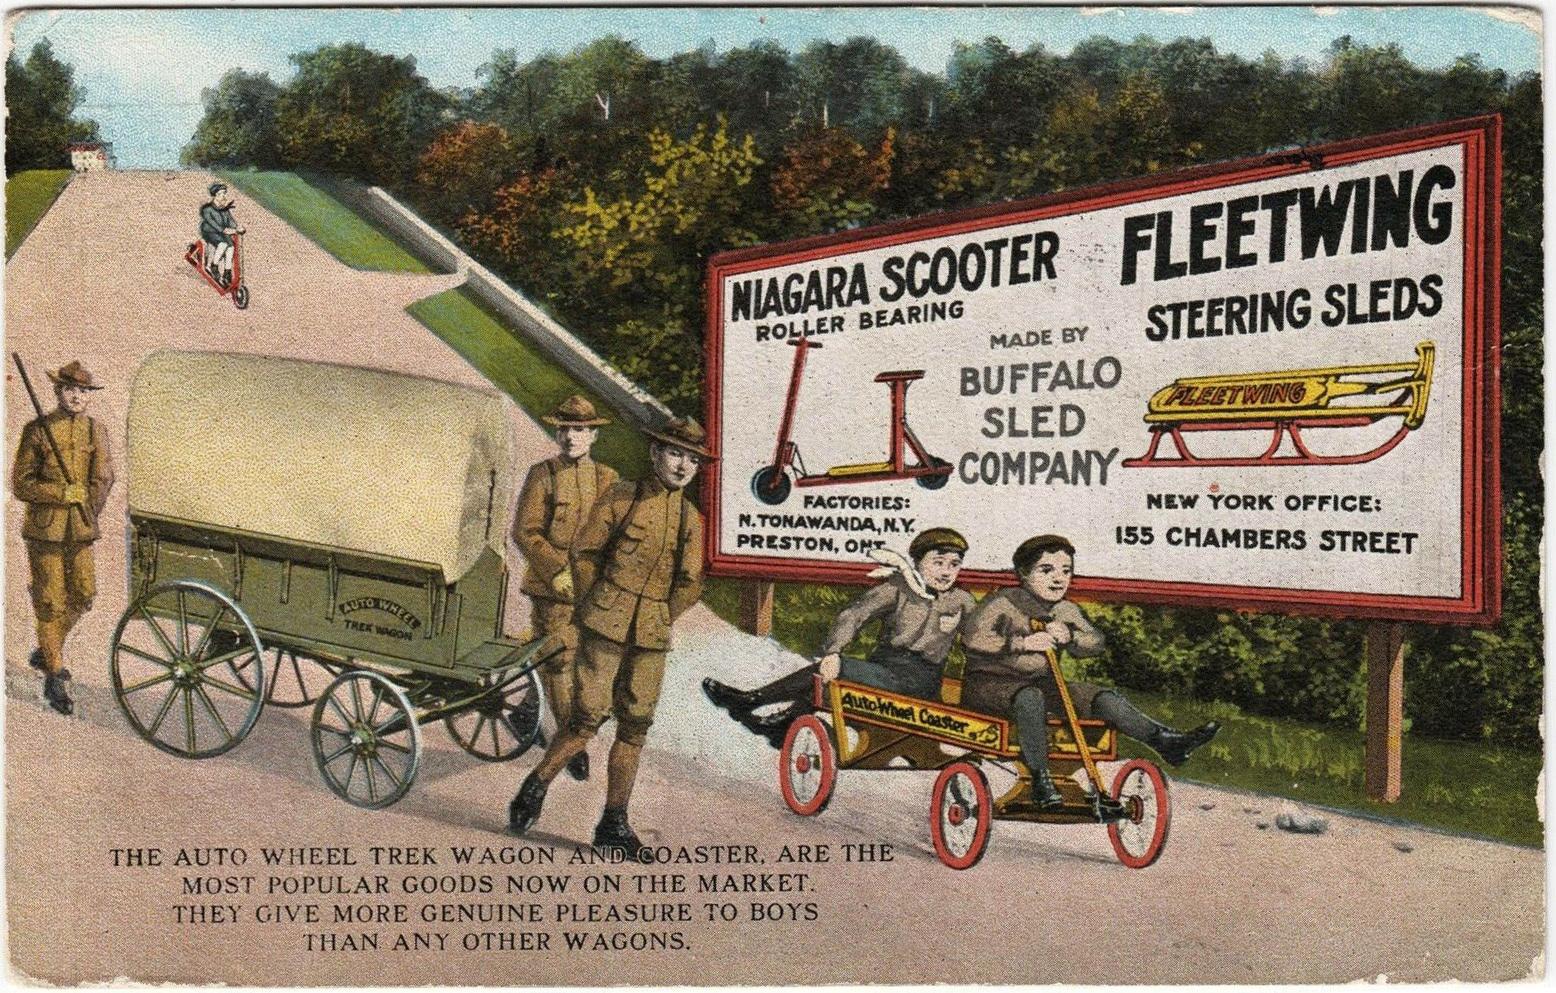 Niagara Scooter, Auto Wheel, Fleetwing, postcard (Buffalo Sled Co., 1919-10-14).jpg